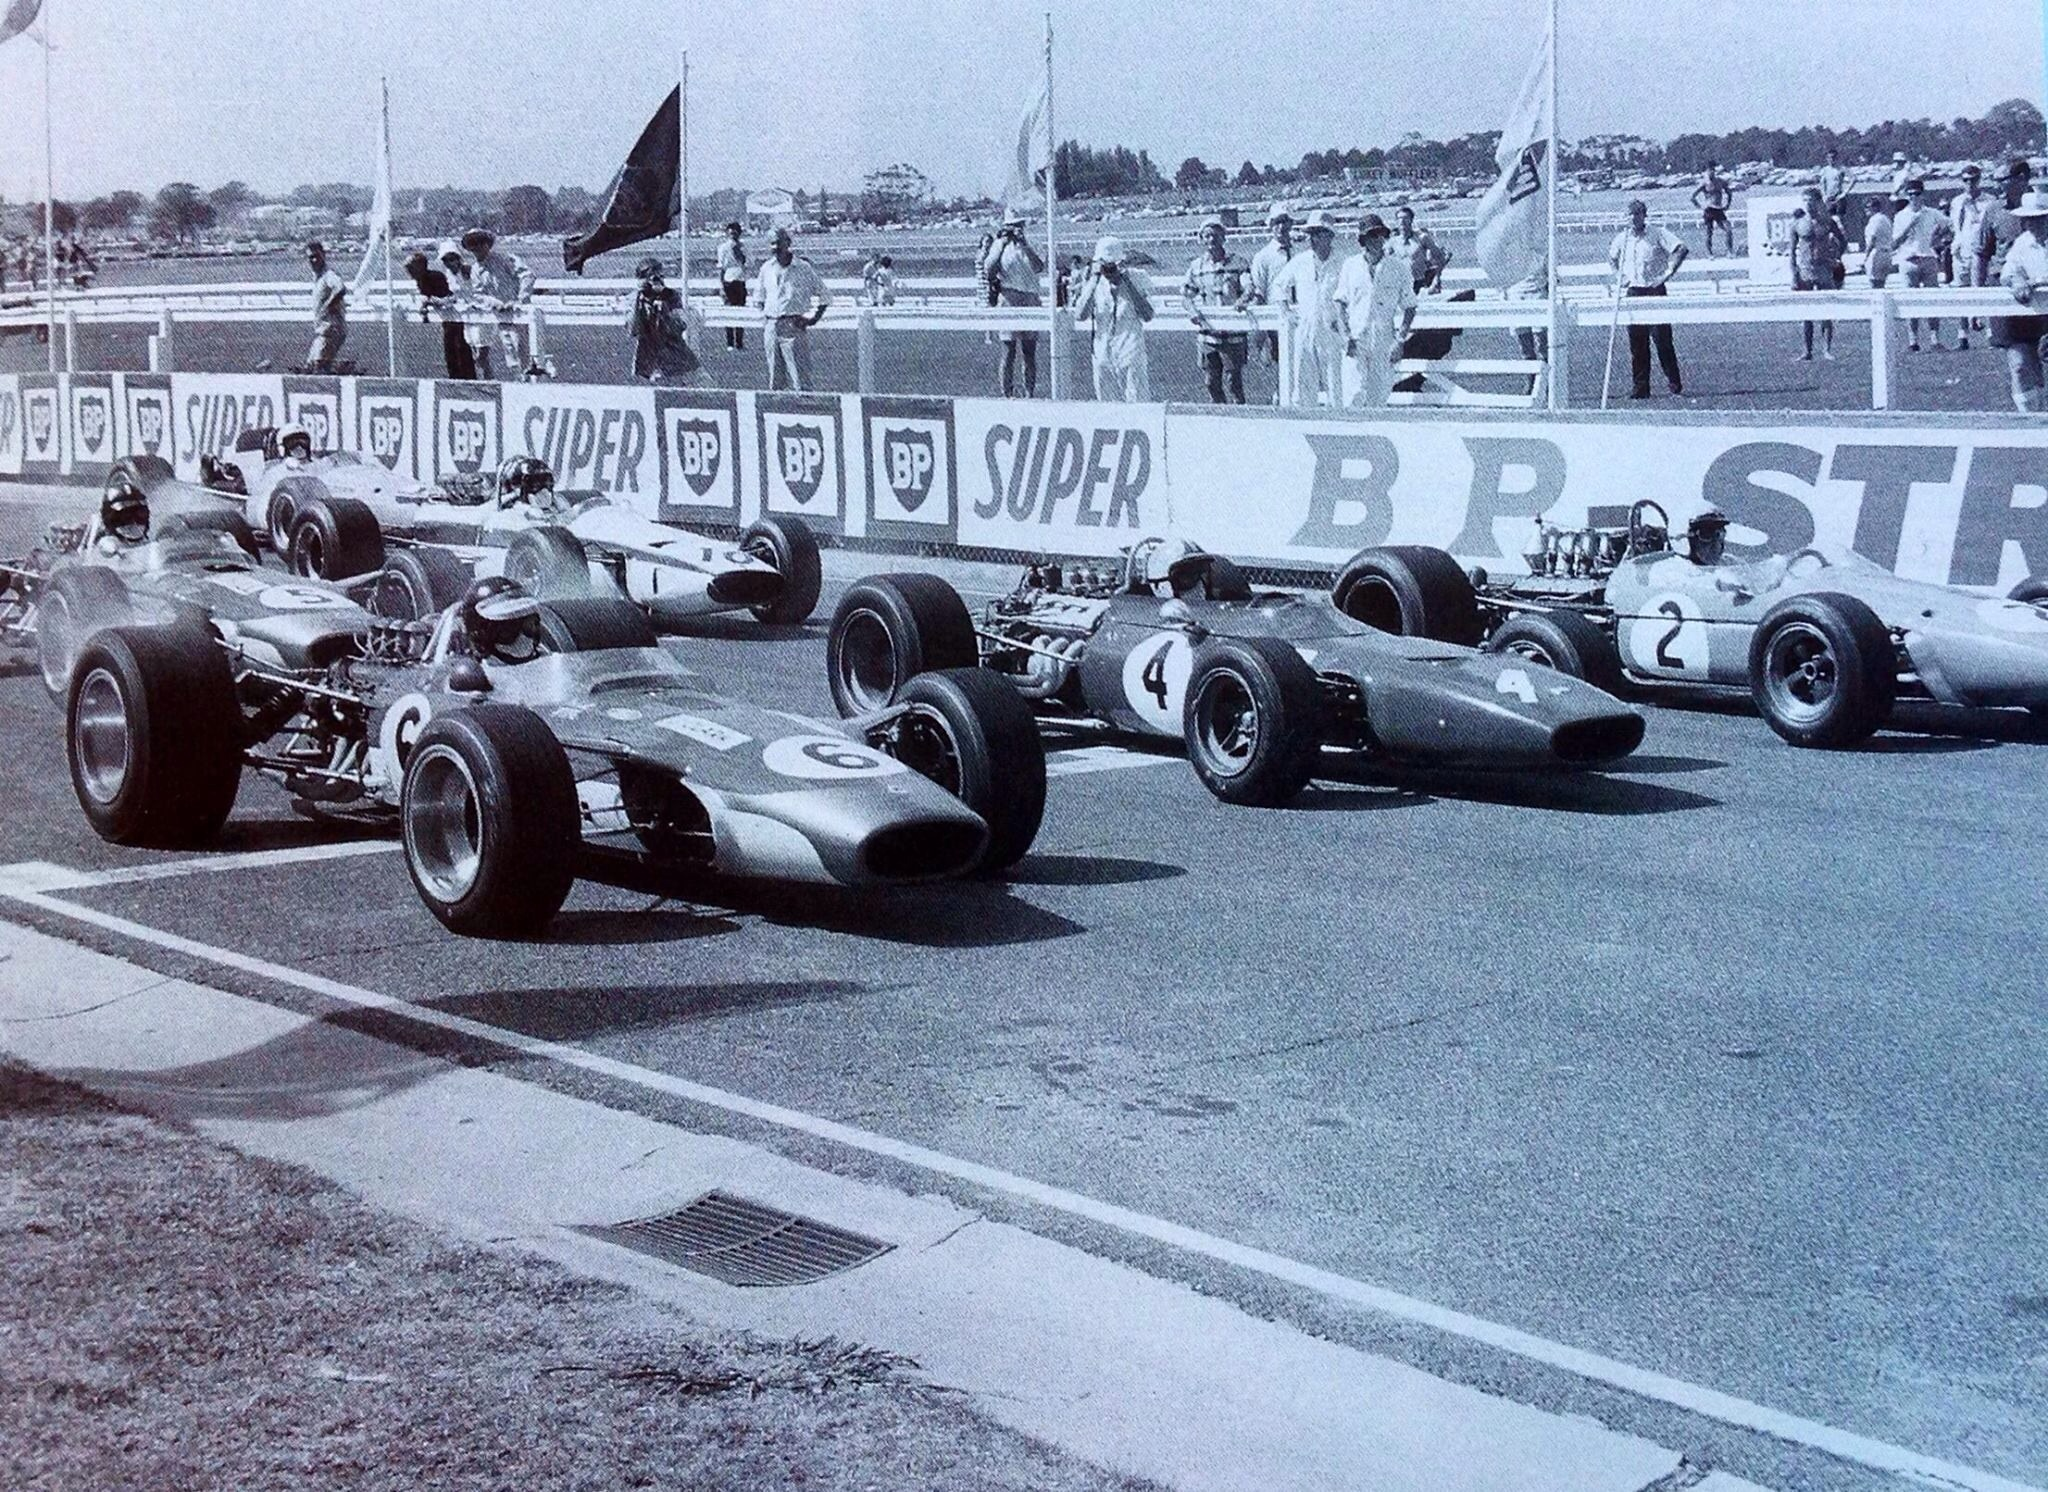 Jim Clark, Chris Amon and Jack Brabham on the front row at the 1968 Australian Grand Prix